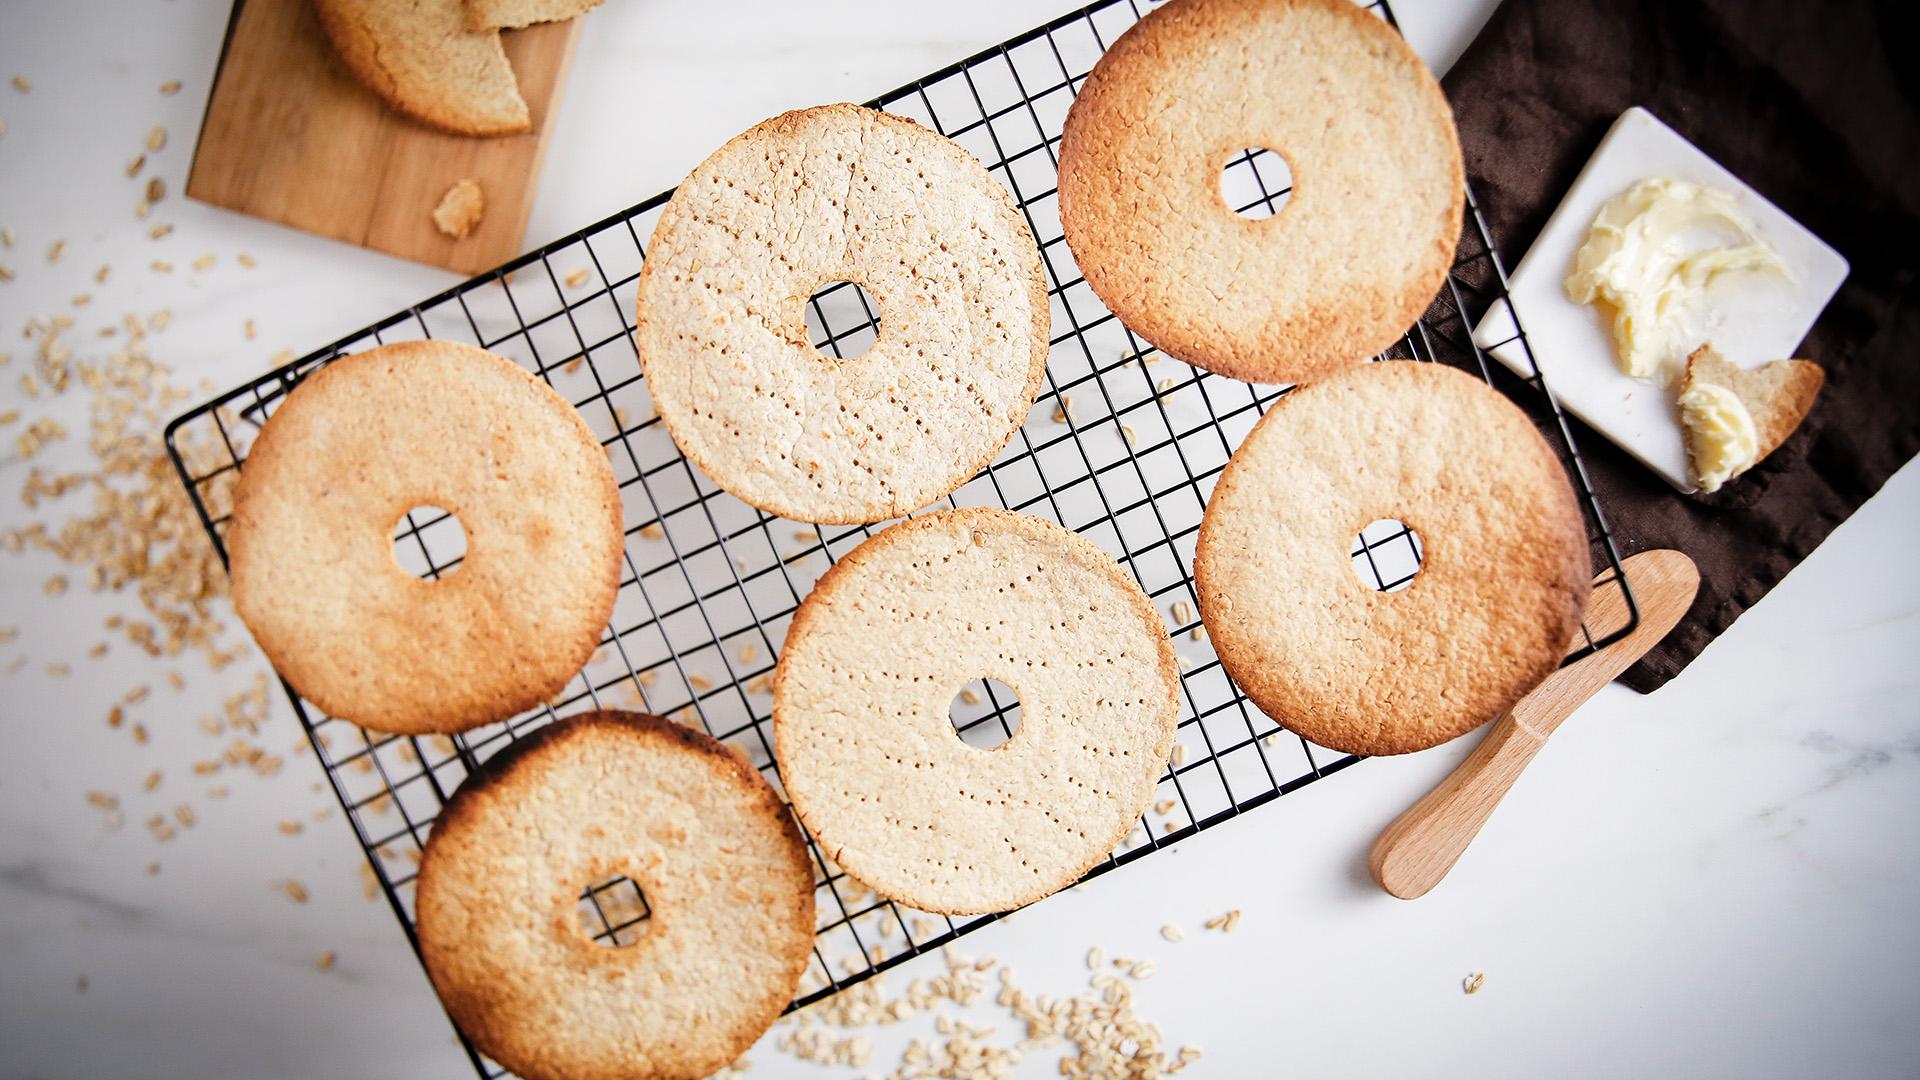 Płaskie chlebki owsiane